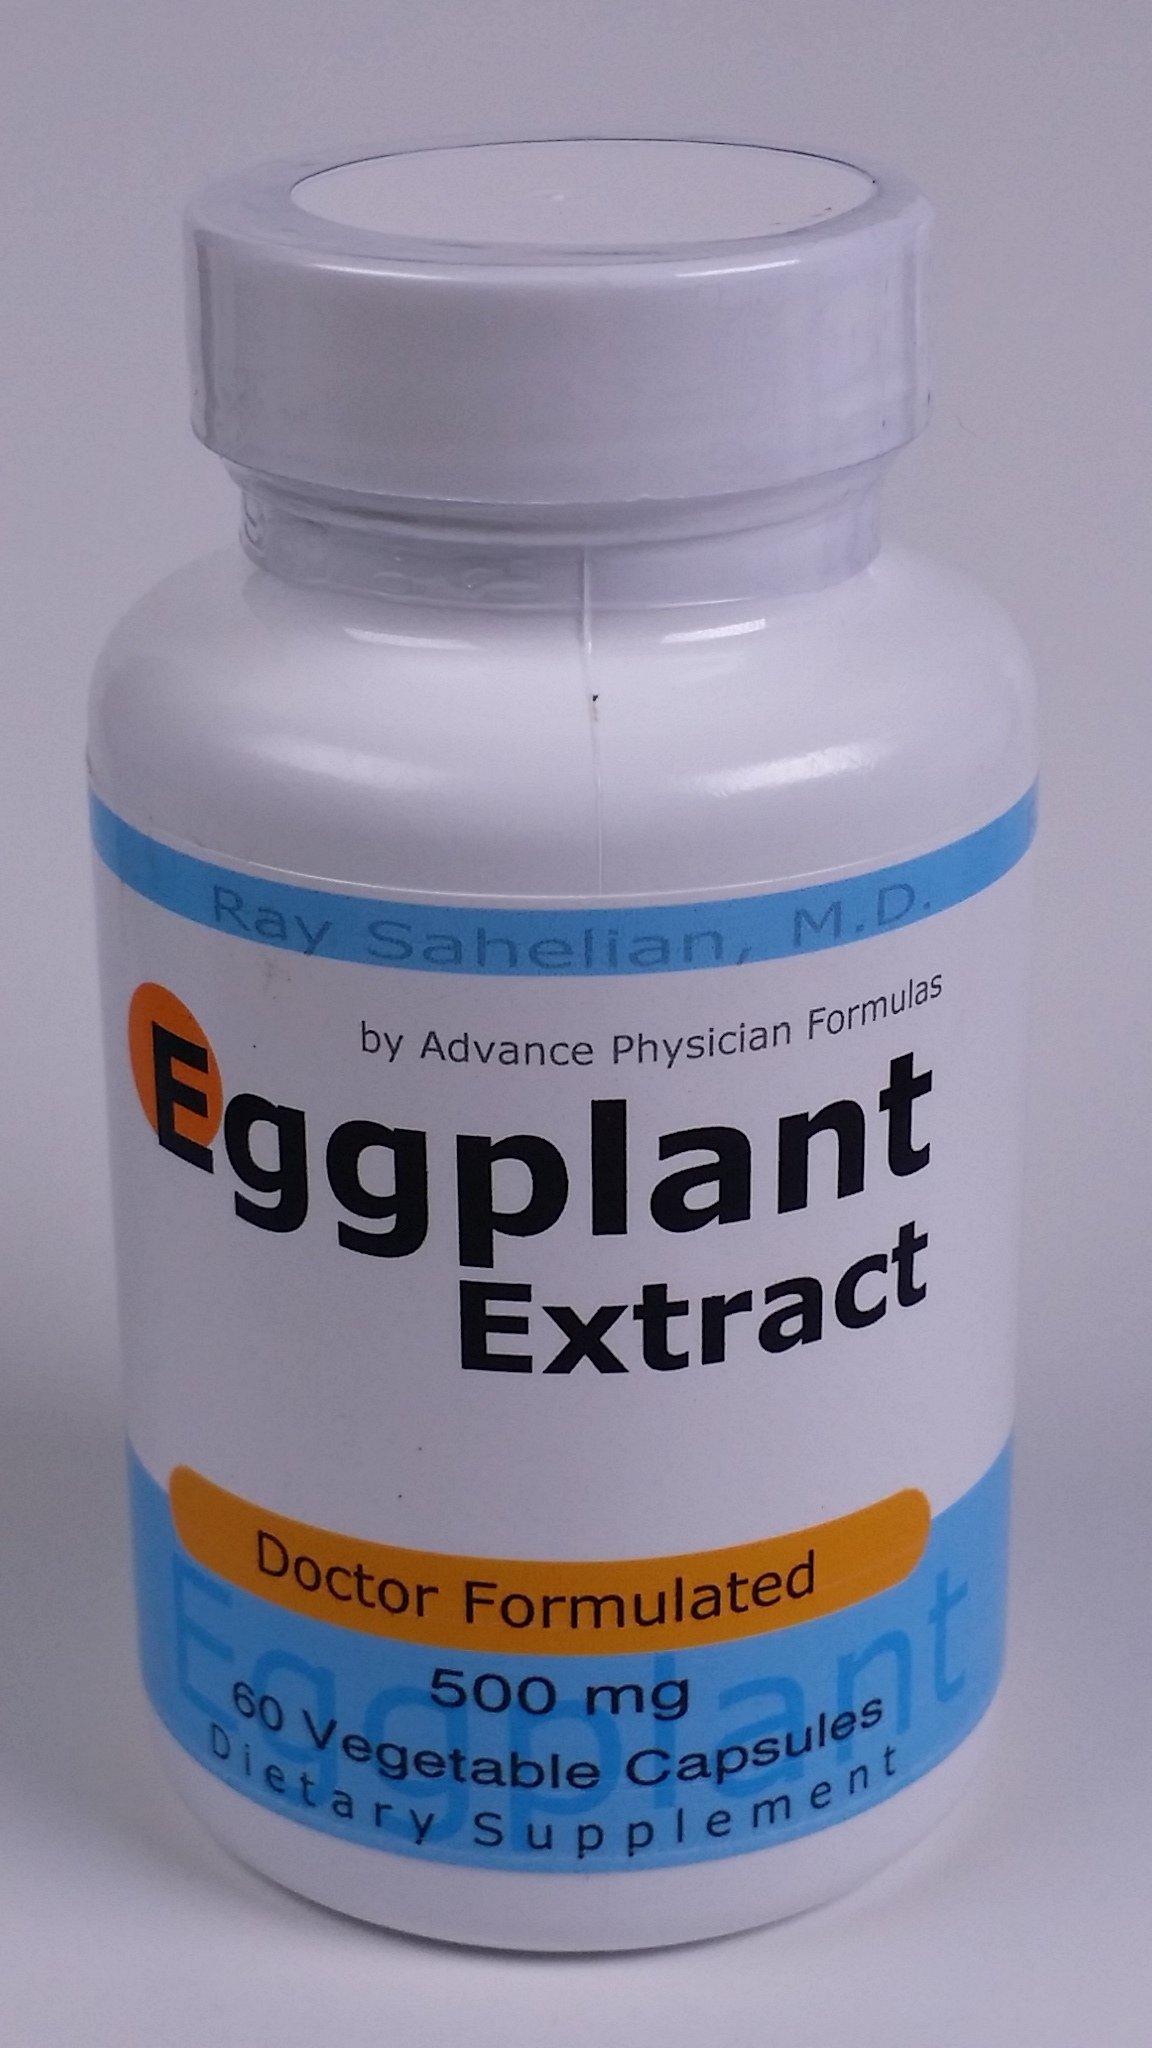 Advance Physician Formulas Inc Eggplant Extract 500 mg 60 Capsules